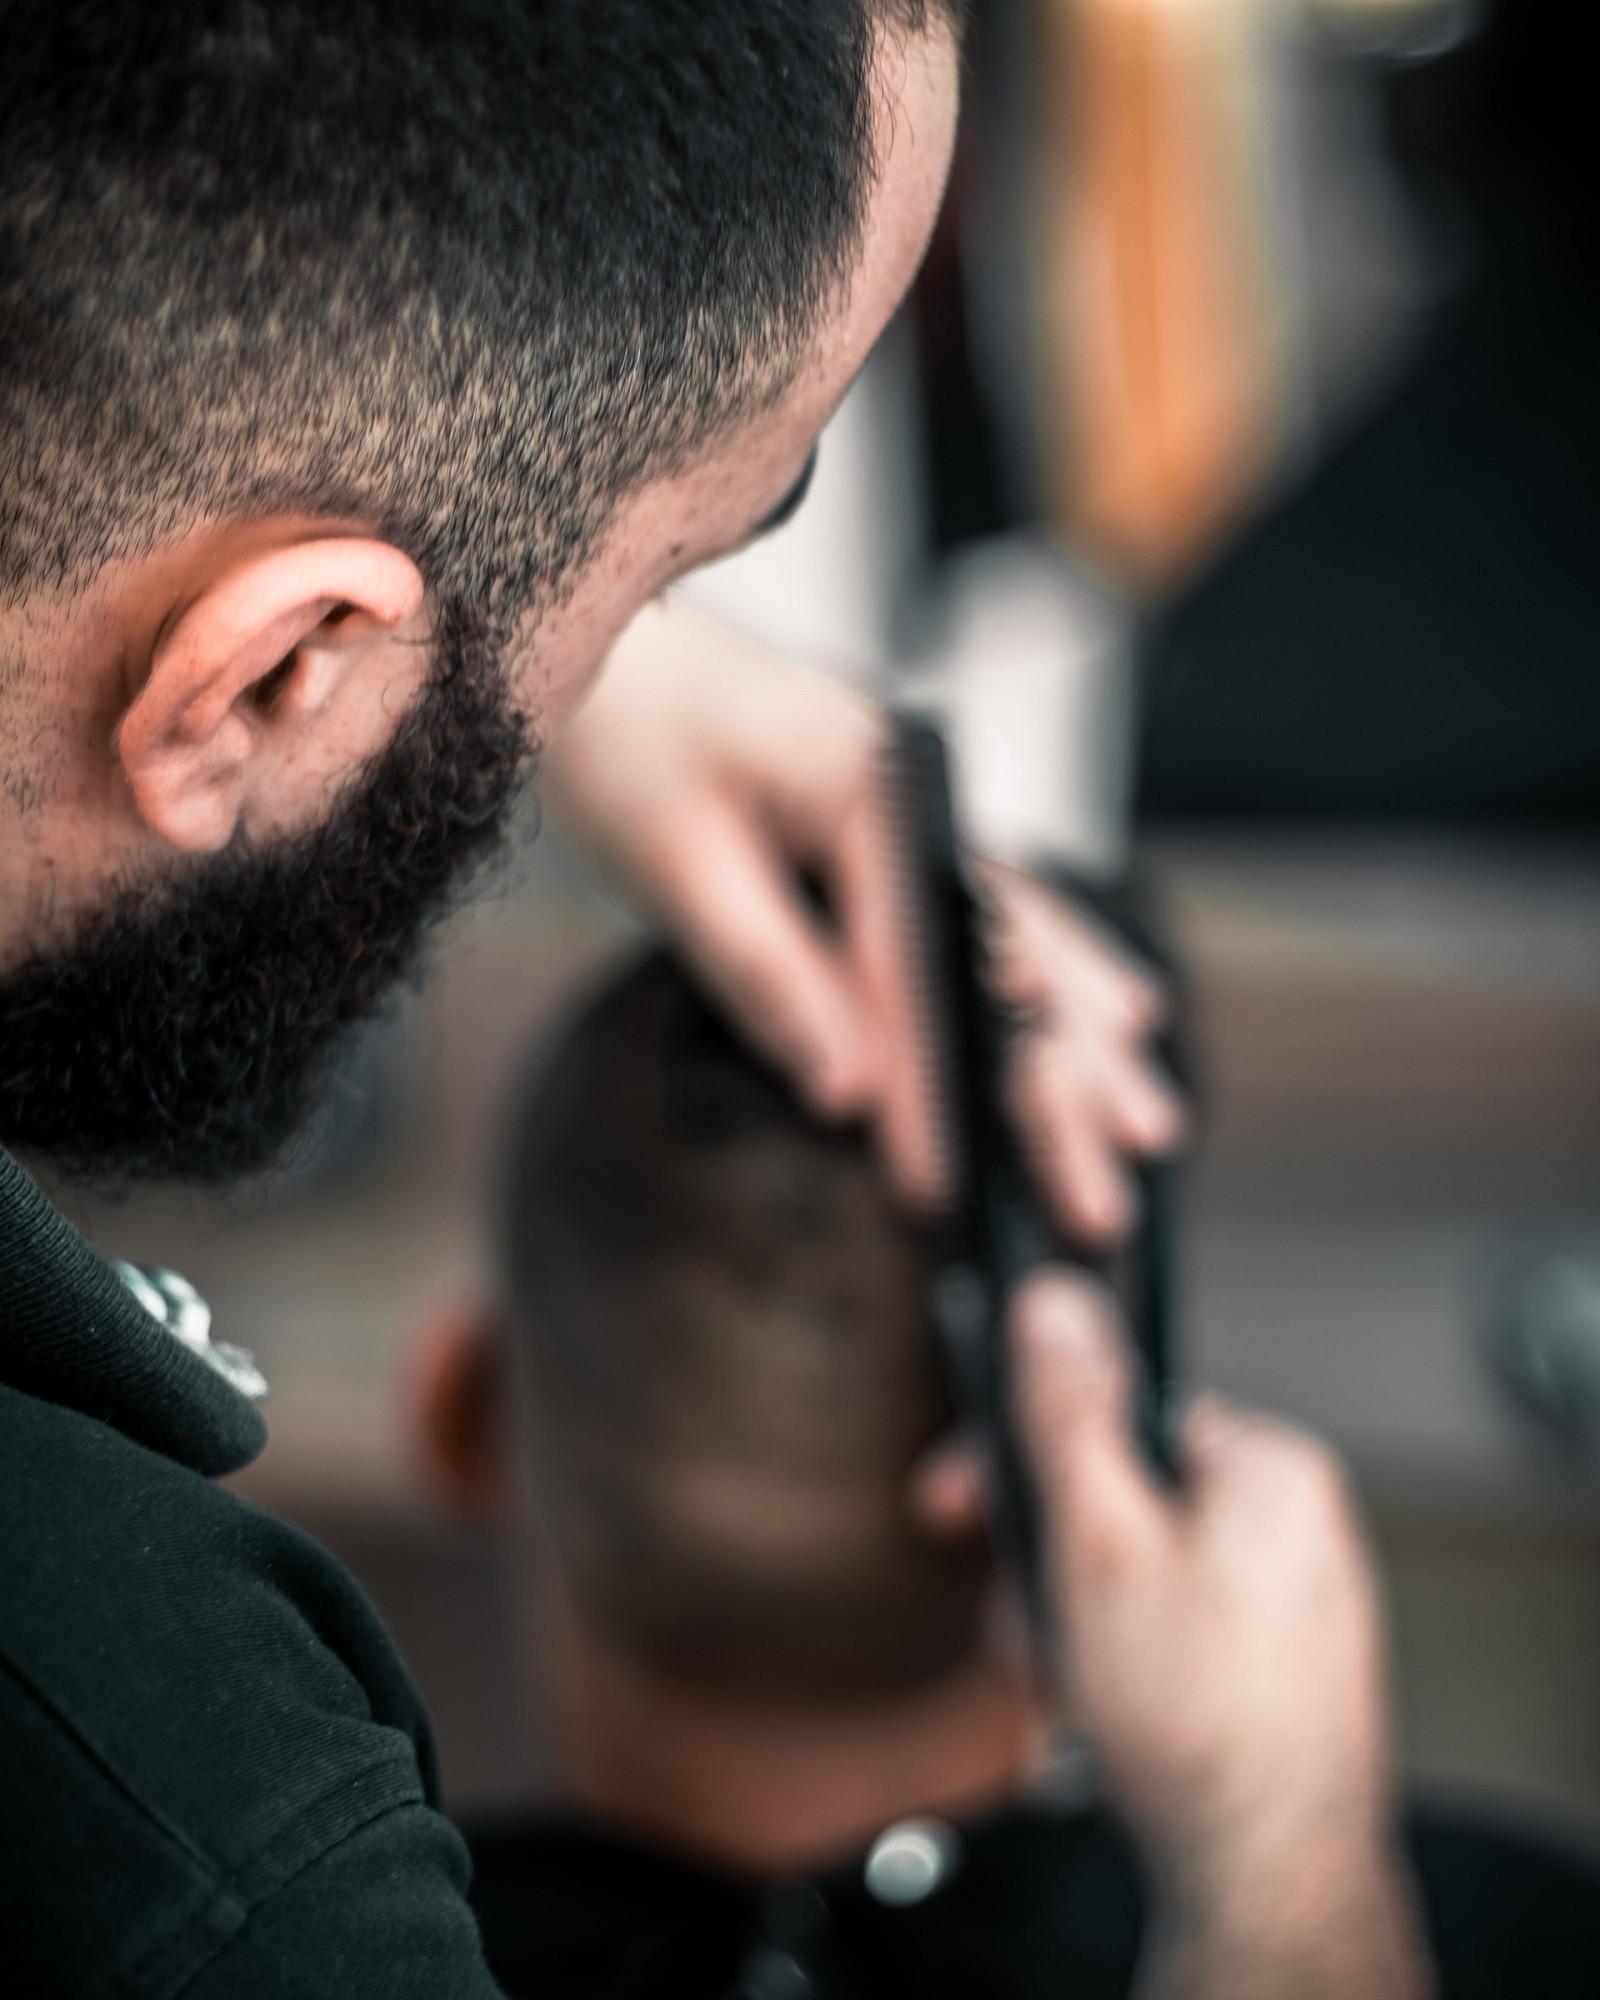 Haircut men for curly hair